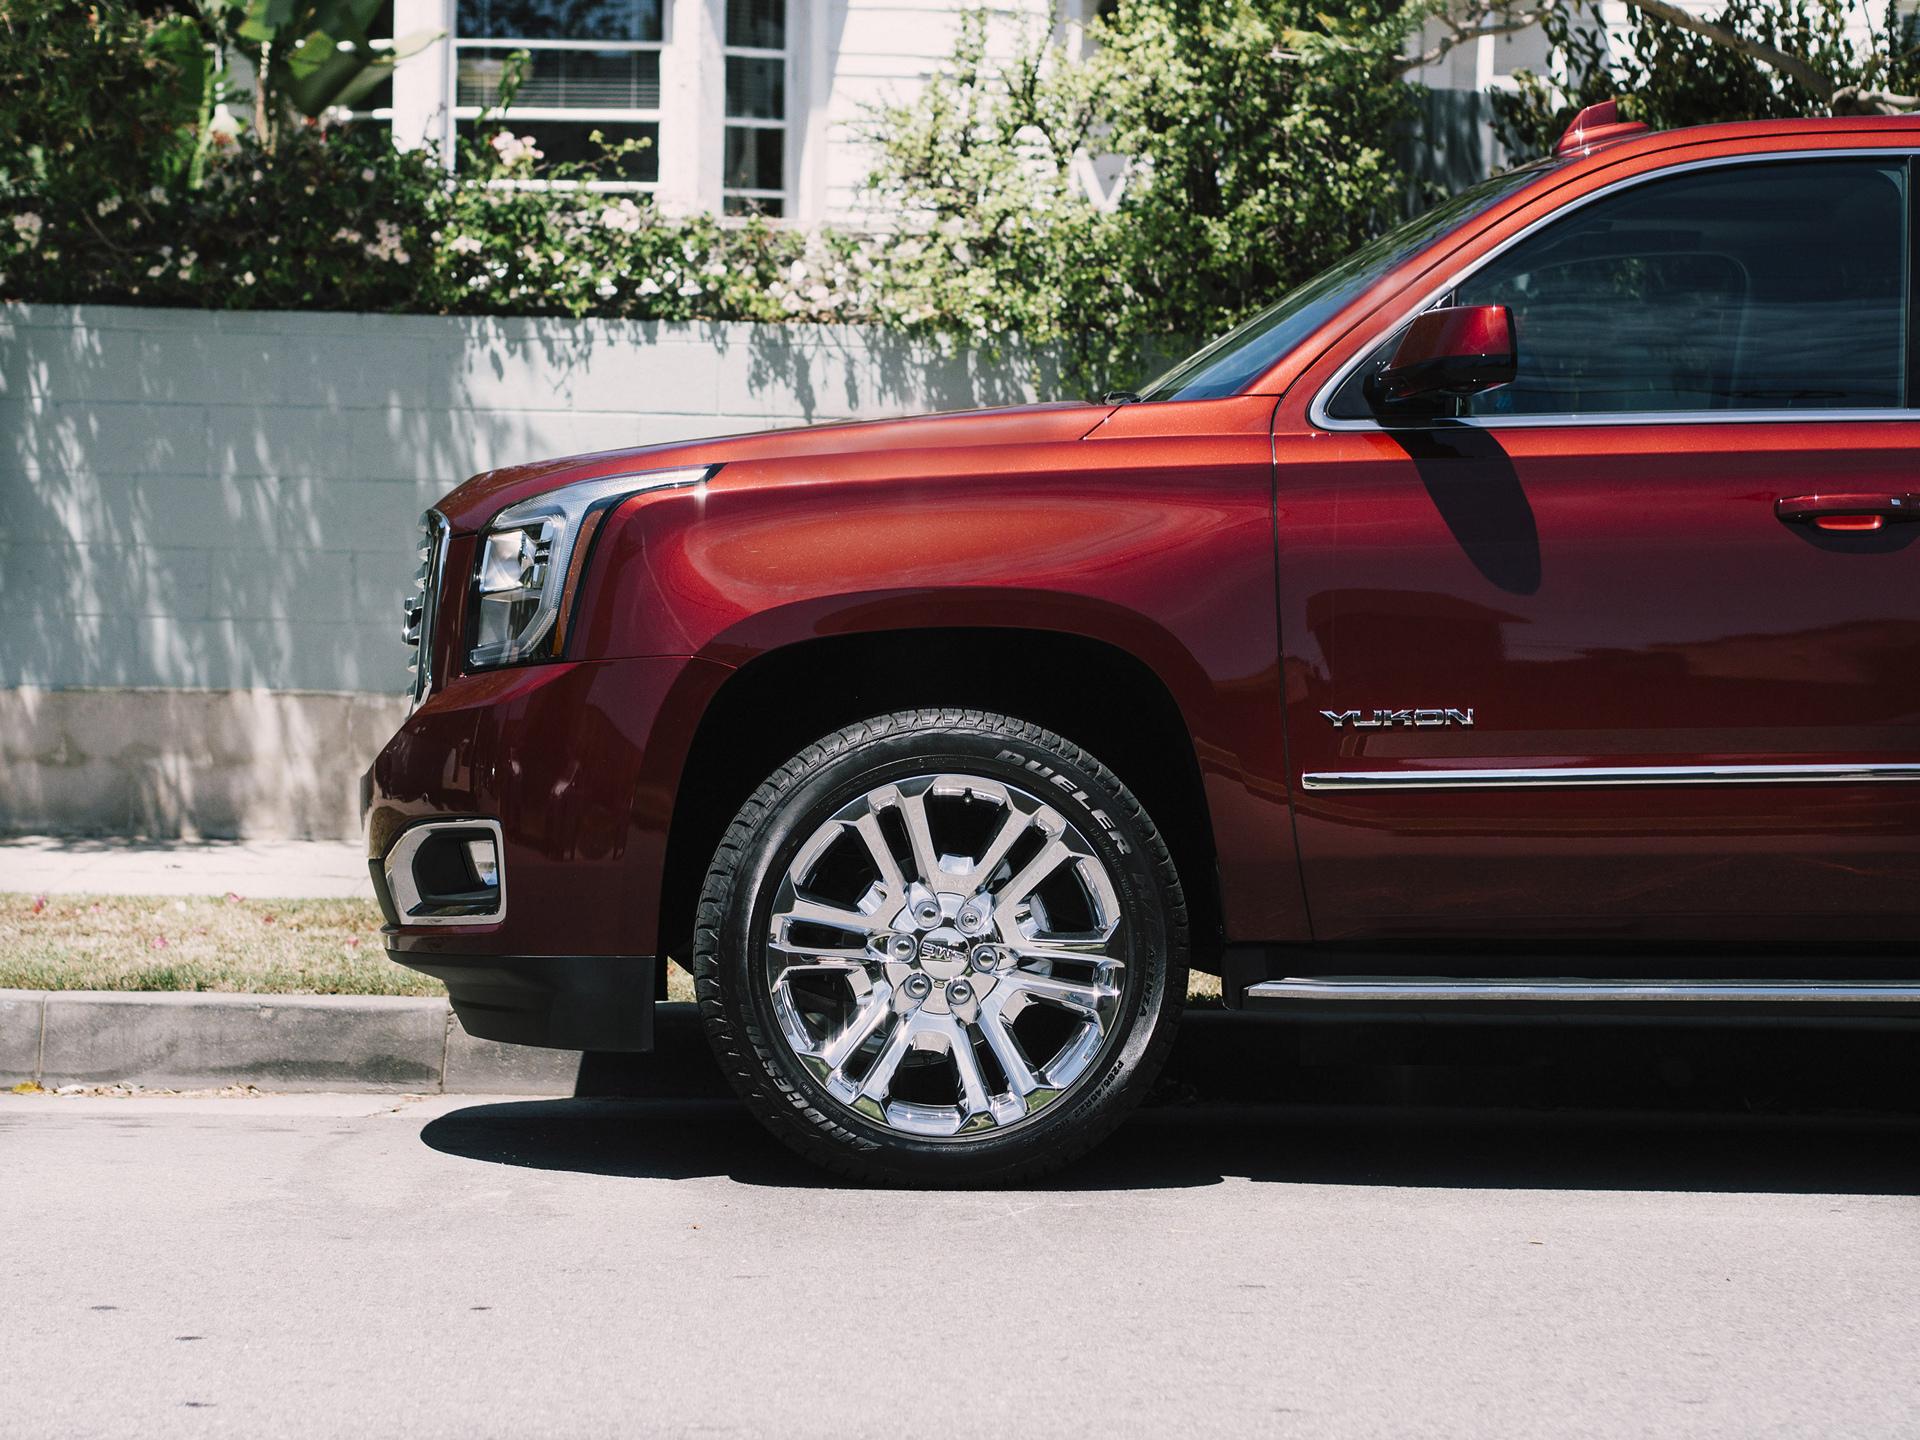 2016 GMC Yukon SLT Premium Edition © General Motors